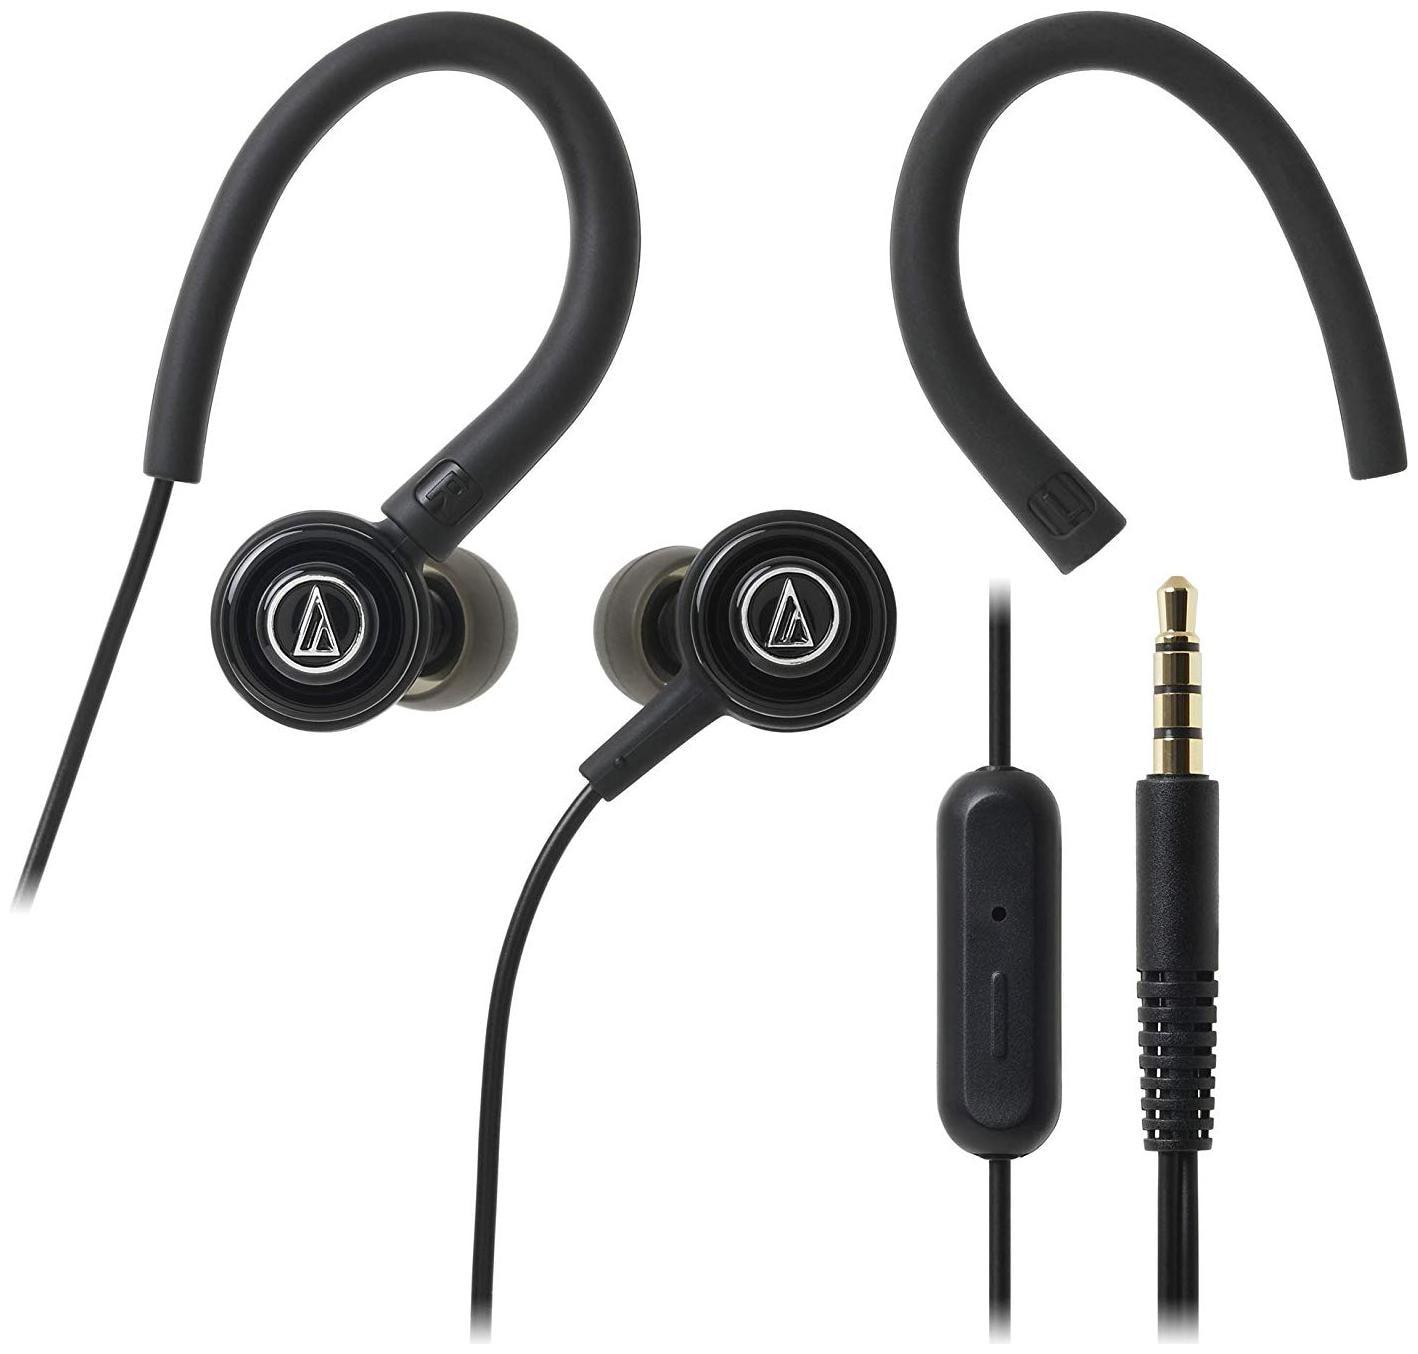 Audio Technica COR150ISBK In Ear Wired Headphone   Black   by Electrop Store